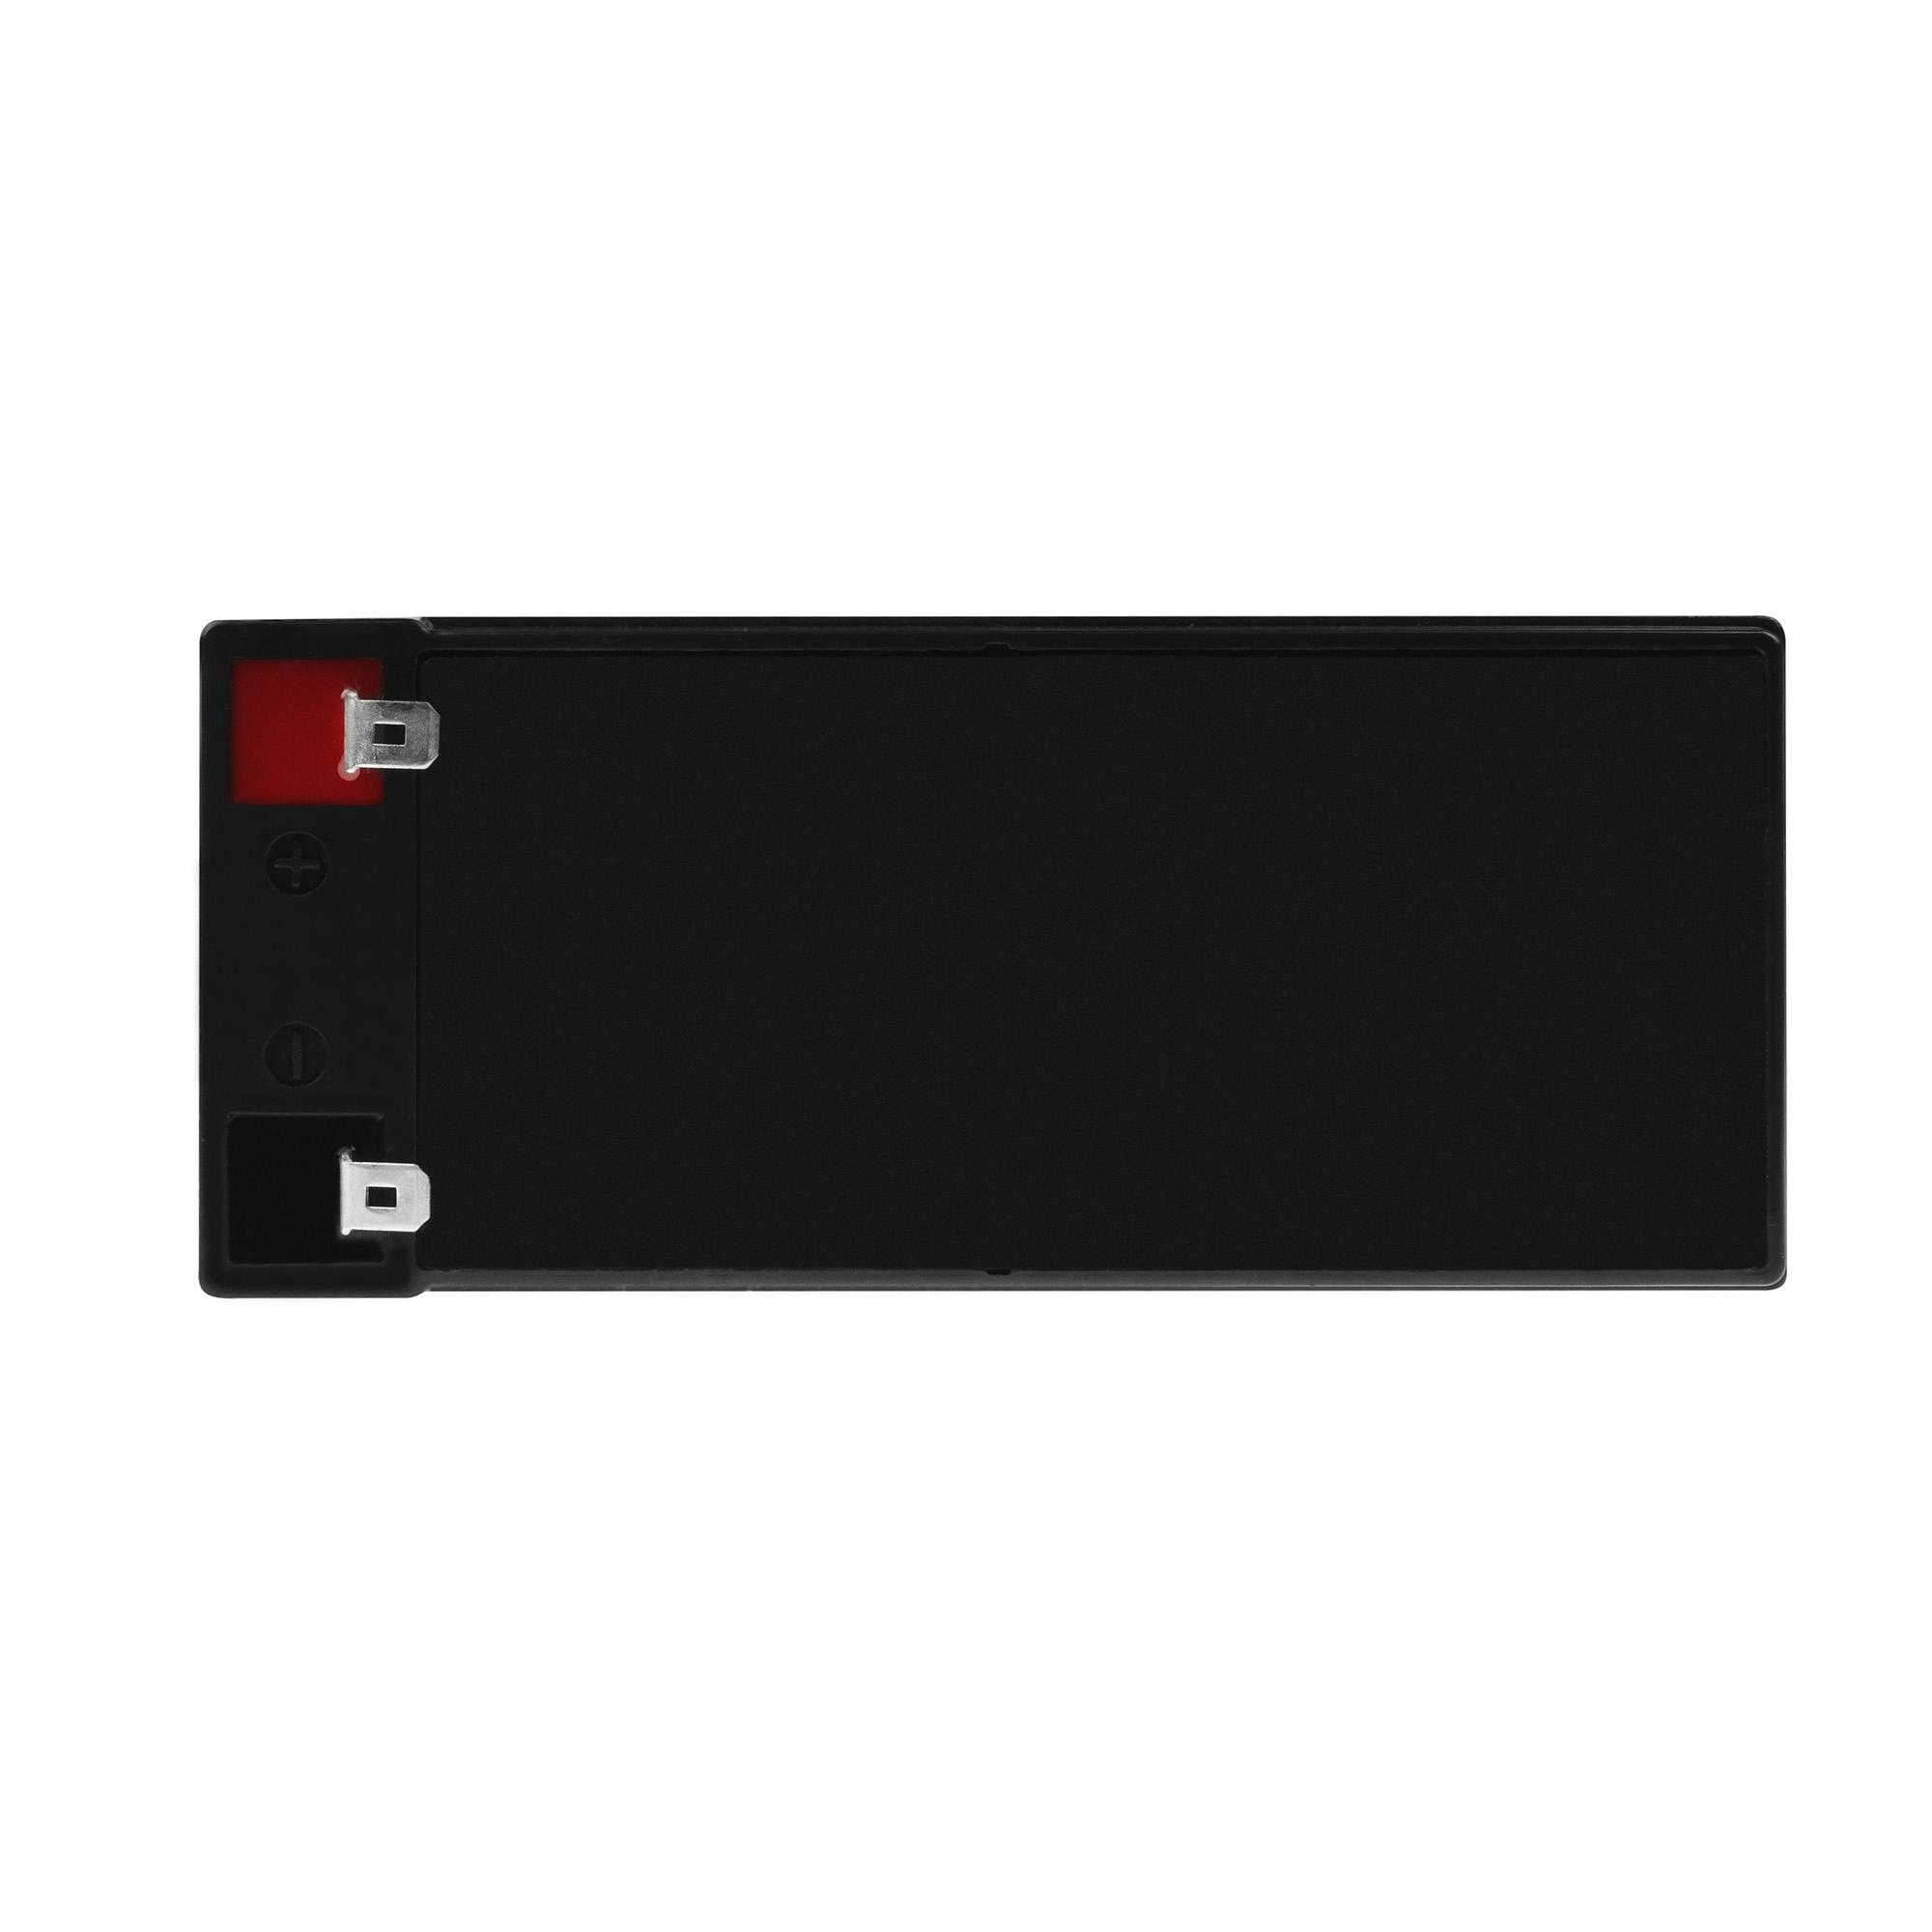 agm vrla battery for mustek powermust 2000 lcd 2000 va. Black Bedroom Furniture Sets. Home Design Ideas